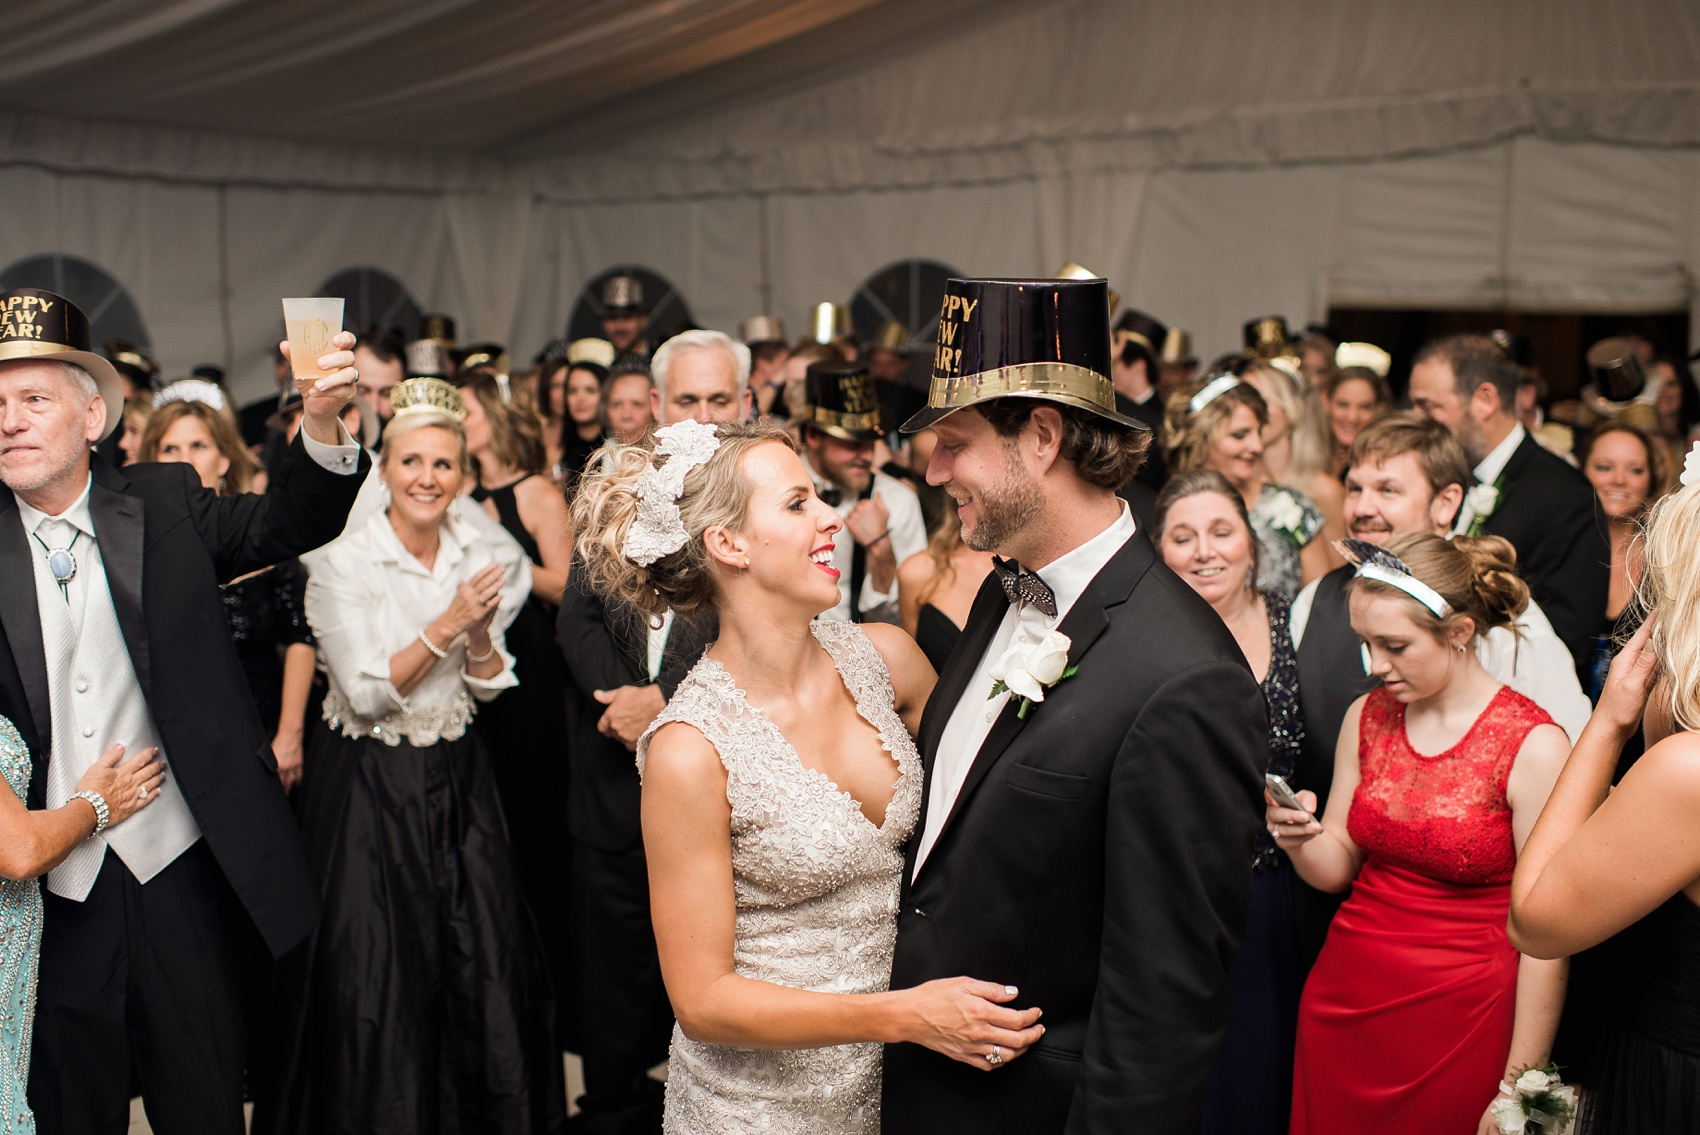 South_carolina_wedding_photographer_0123.jpg